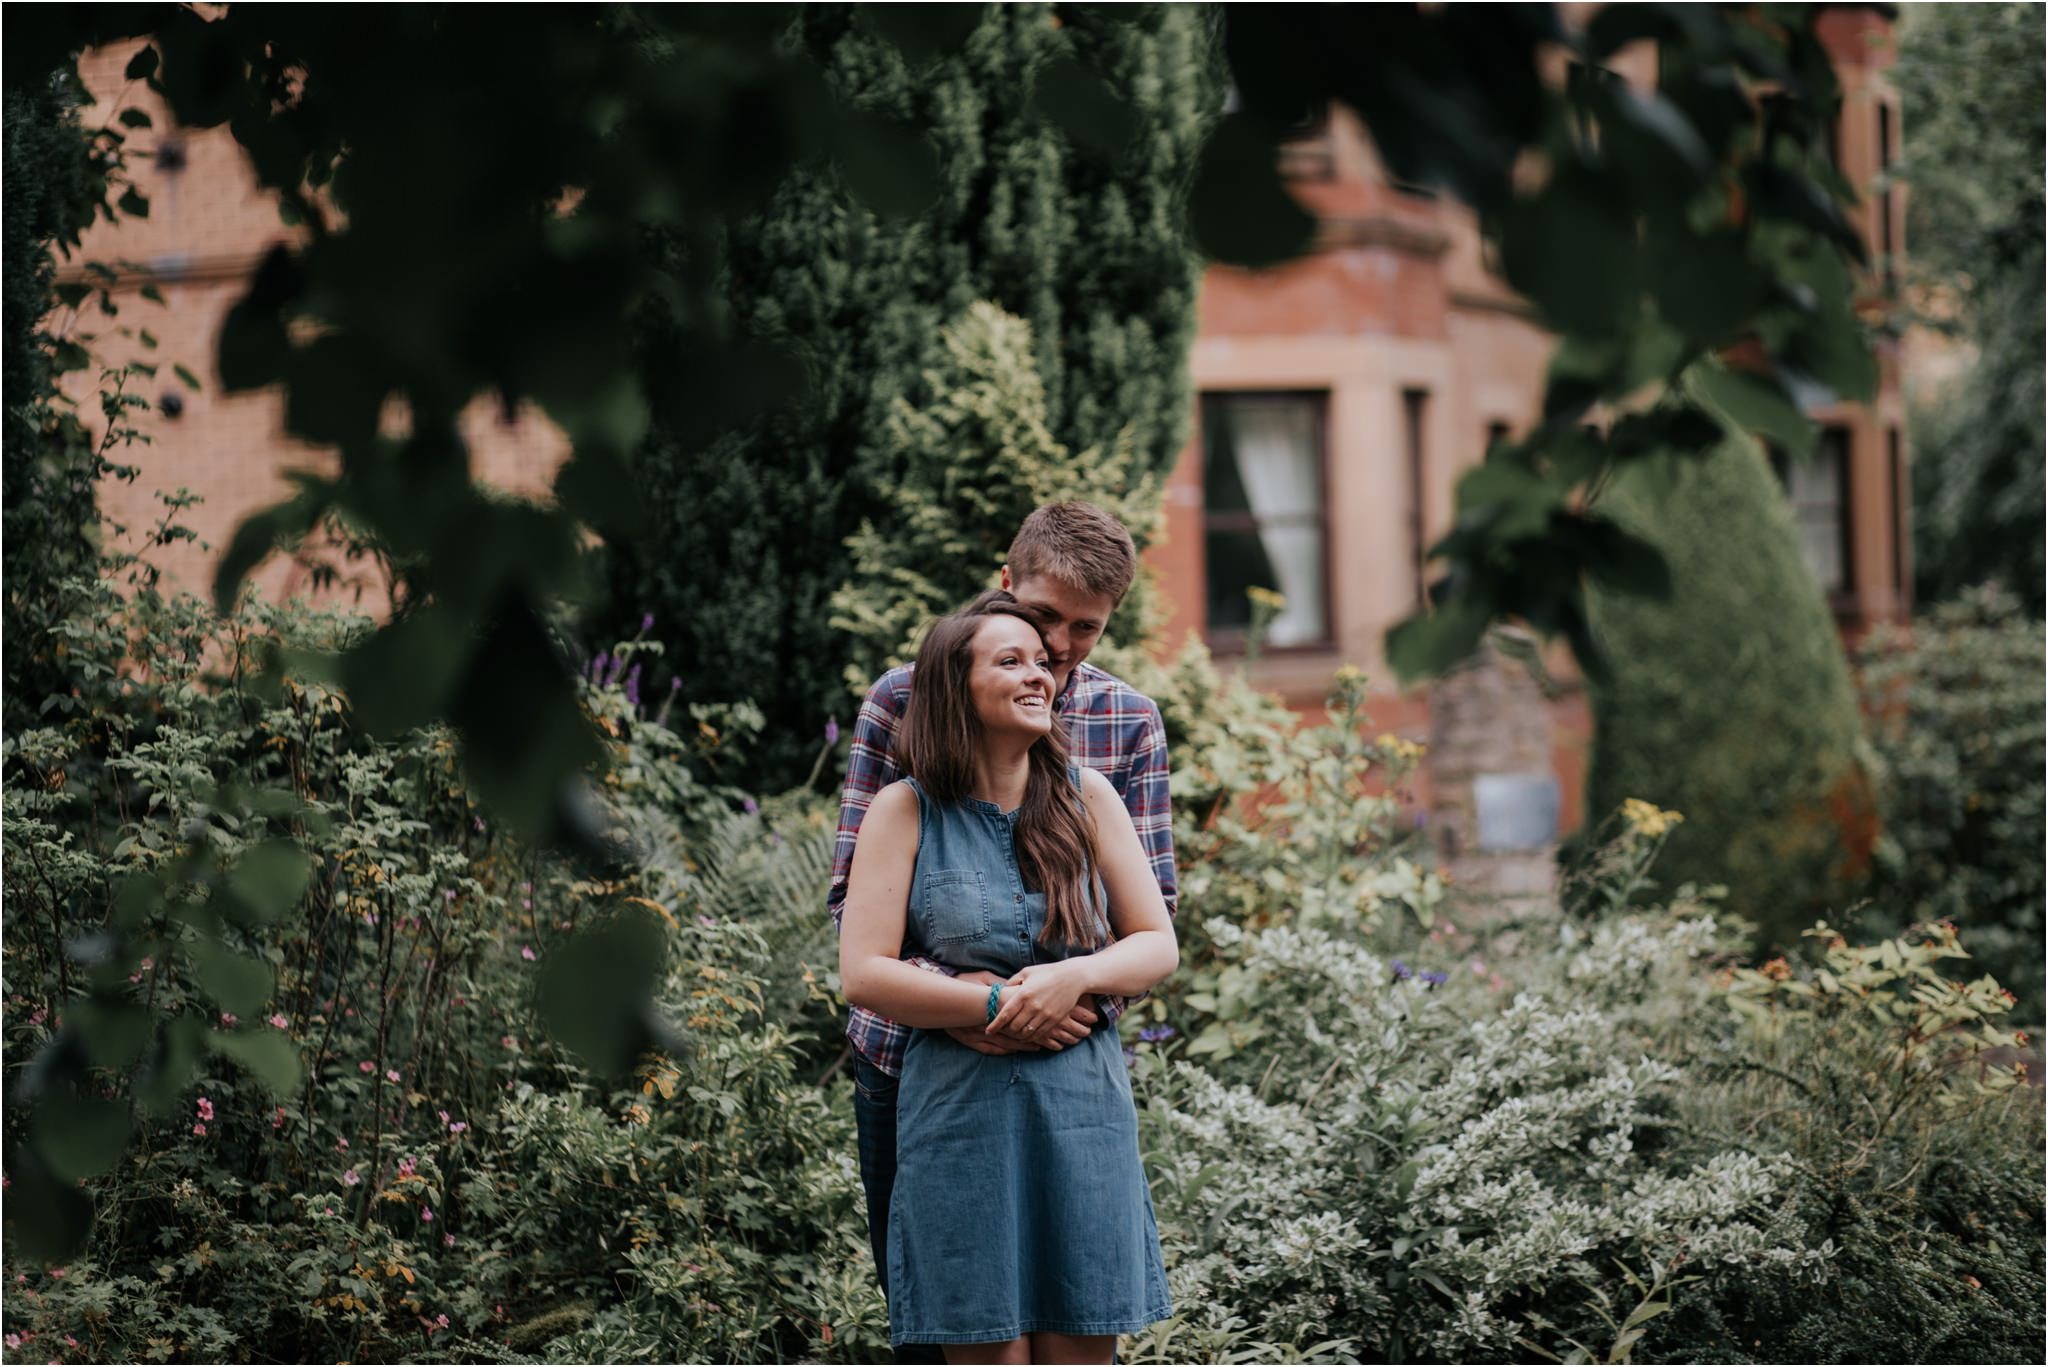 Photography 78 - Glasgow Wedding Photographer - Corrie Jonathan Glasgow West End_0001.jpg